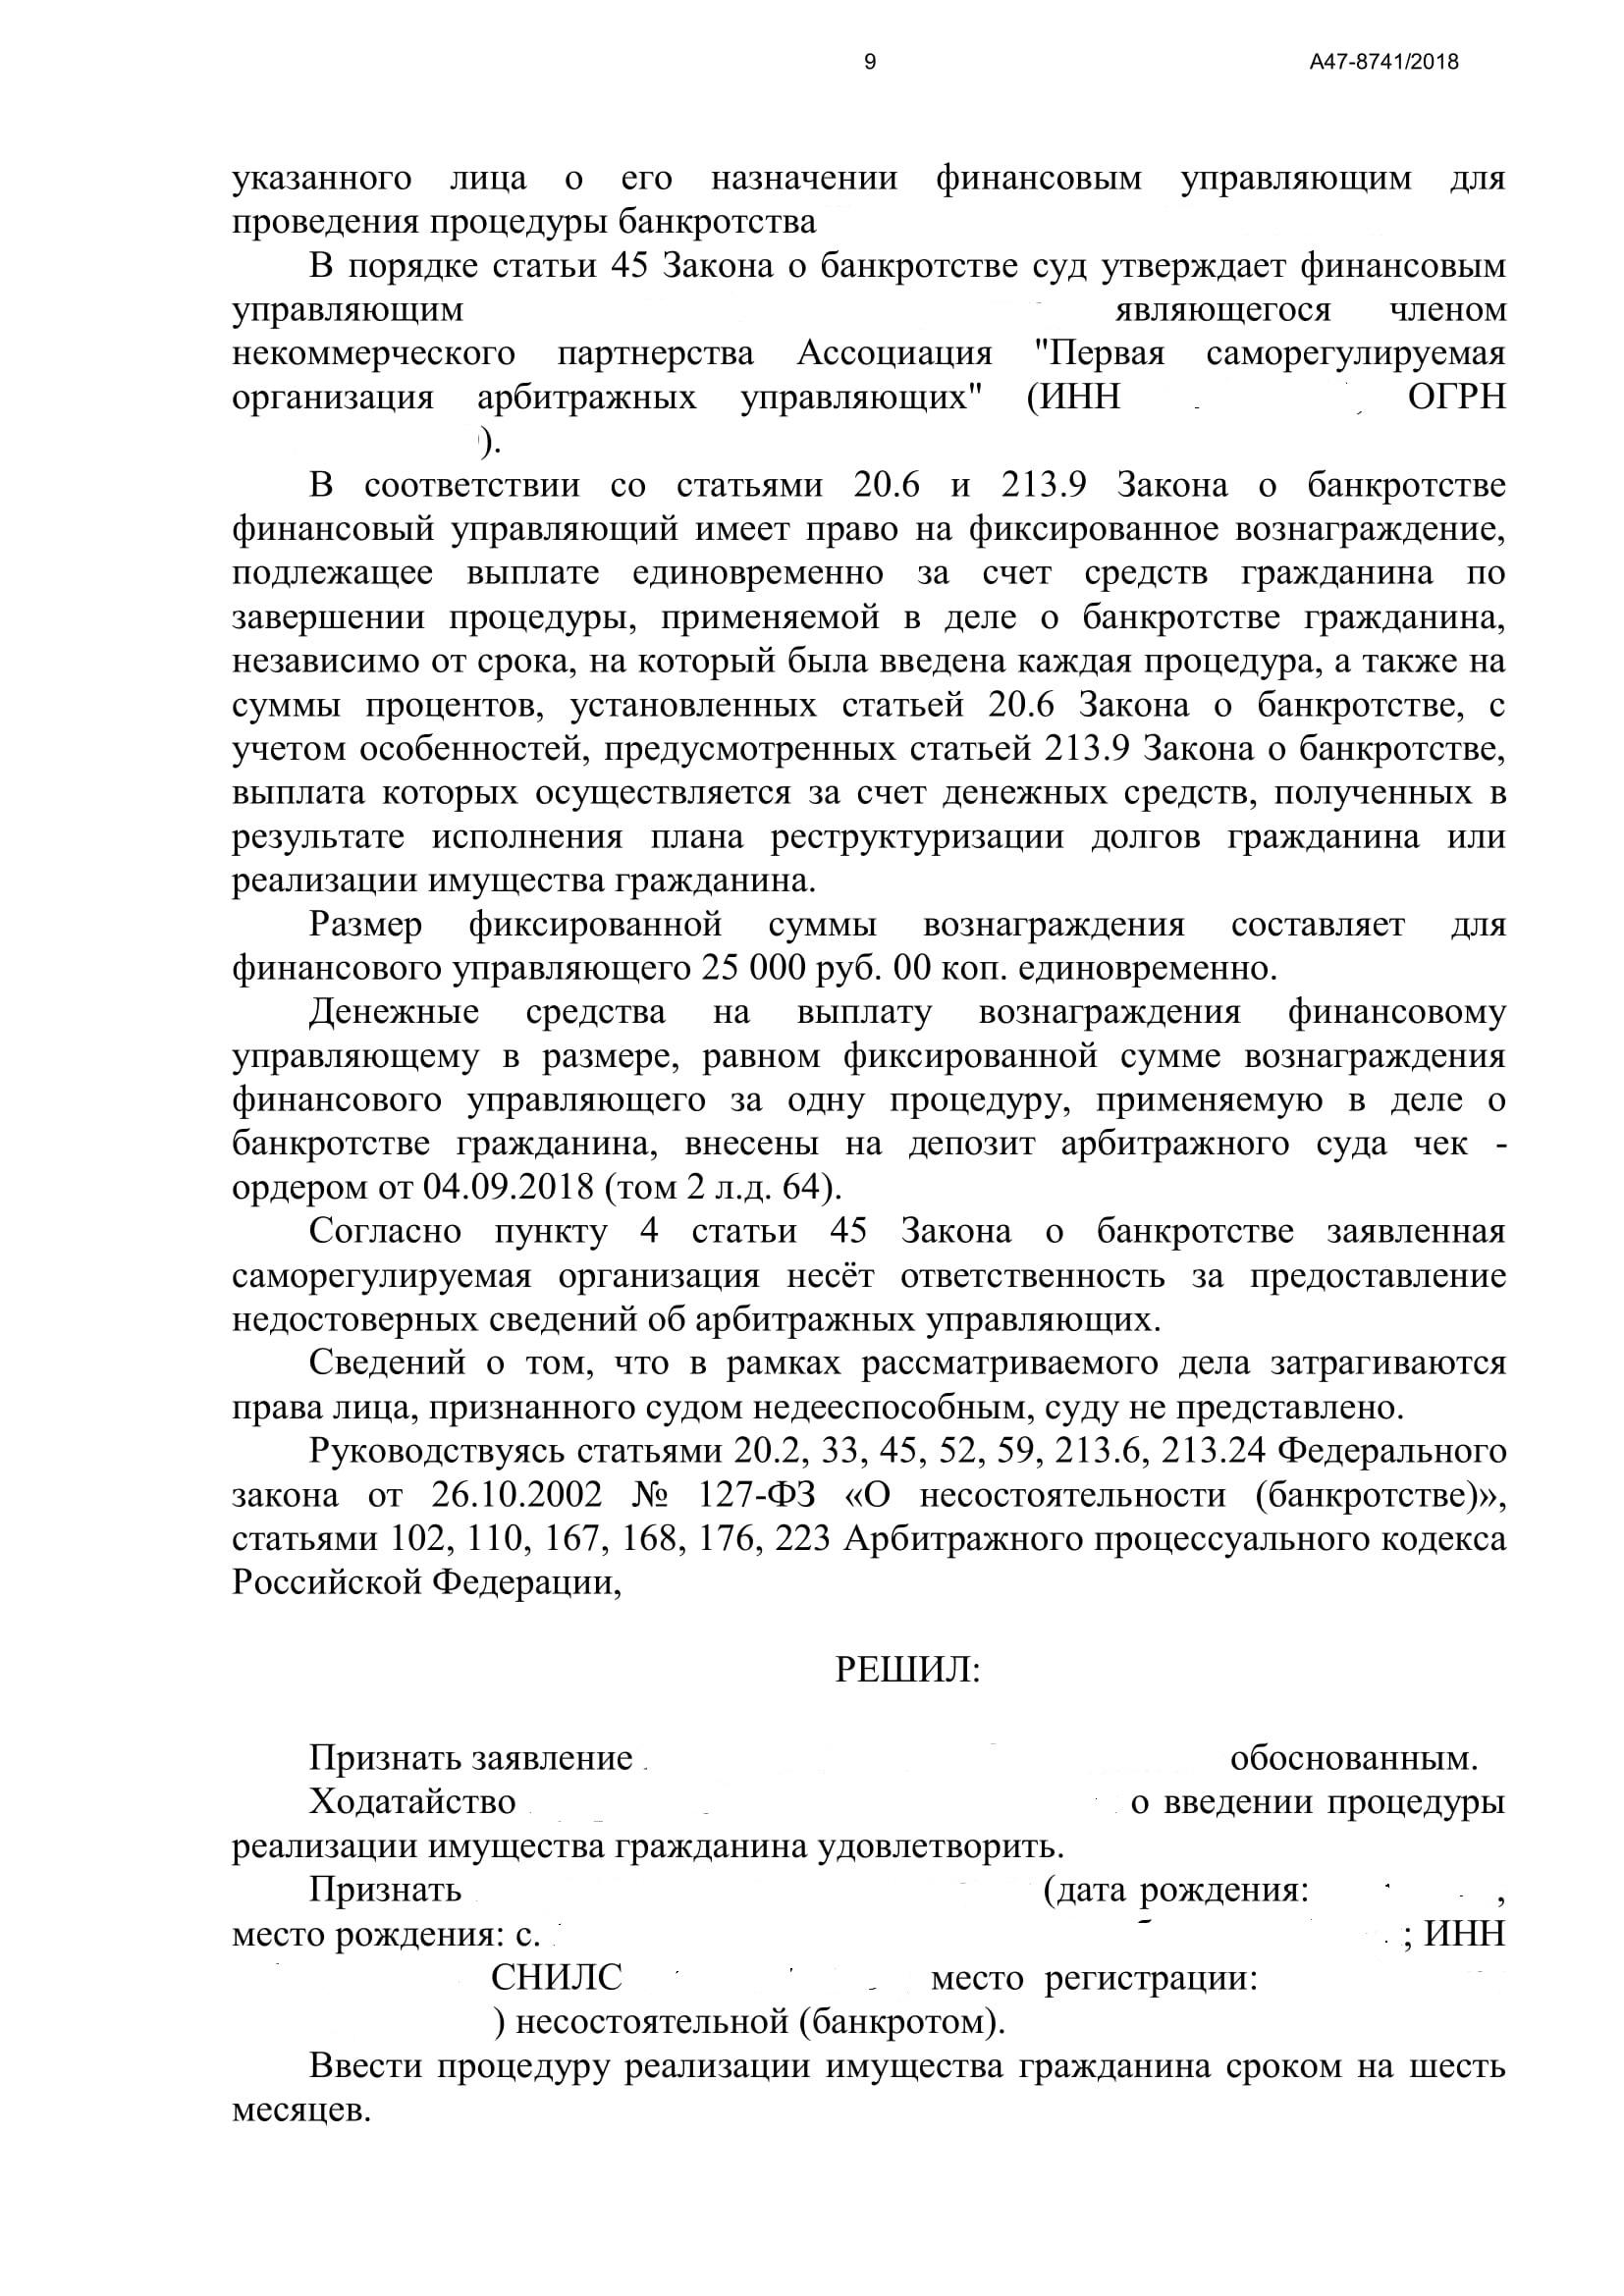 консультация юриста по трудовому праву в